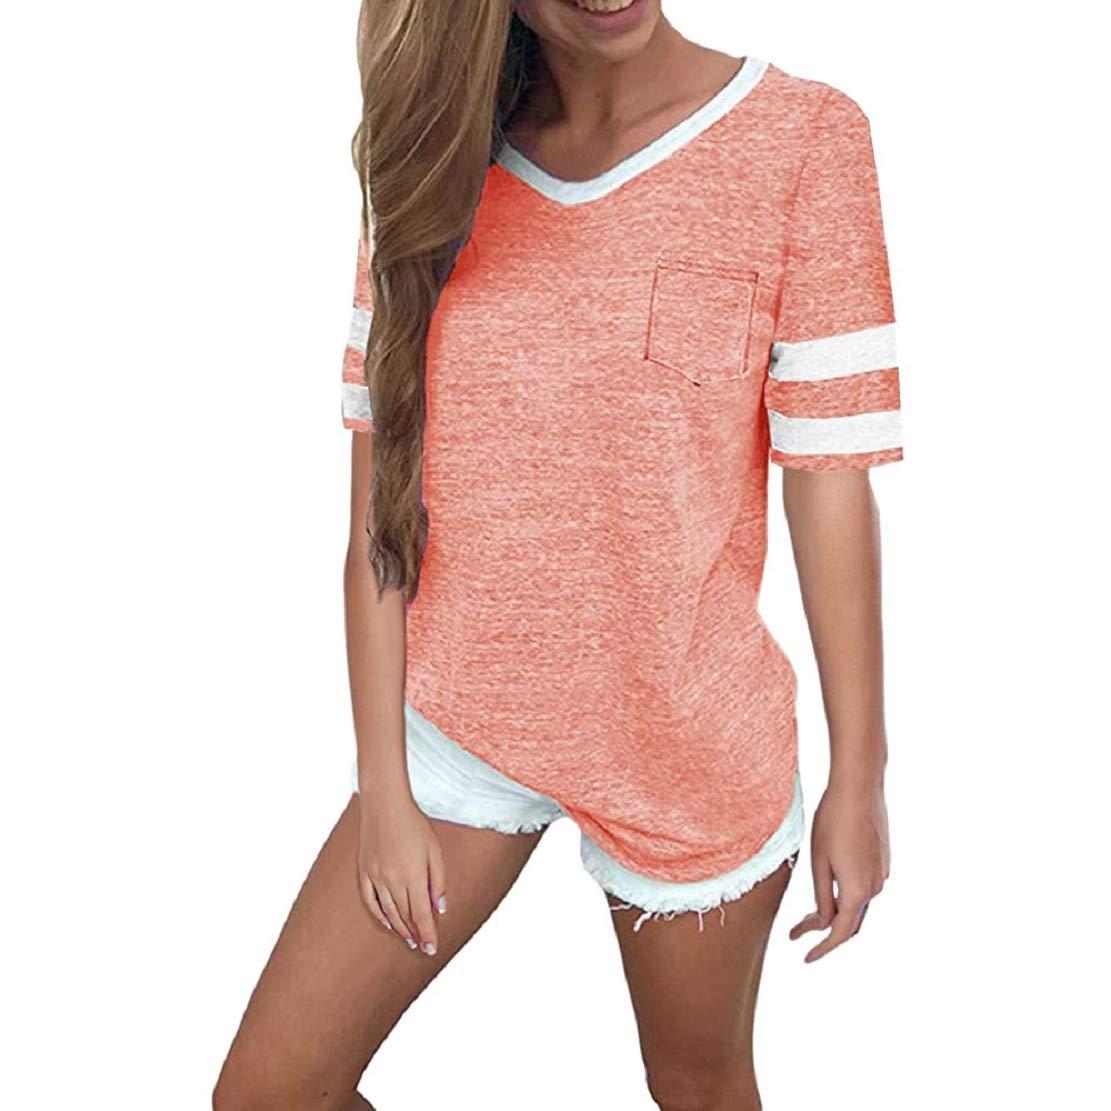 Women Summer Casual Short Sleeve V Neck T Shirt Striped Print Baseball T-Shirt Blouse Tops by Lowprofile Pink